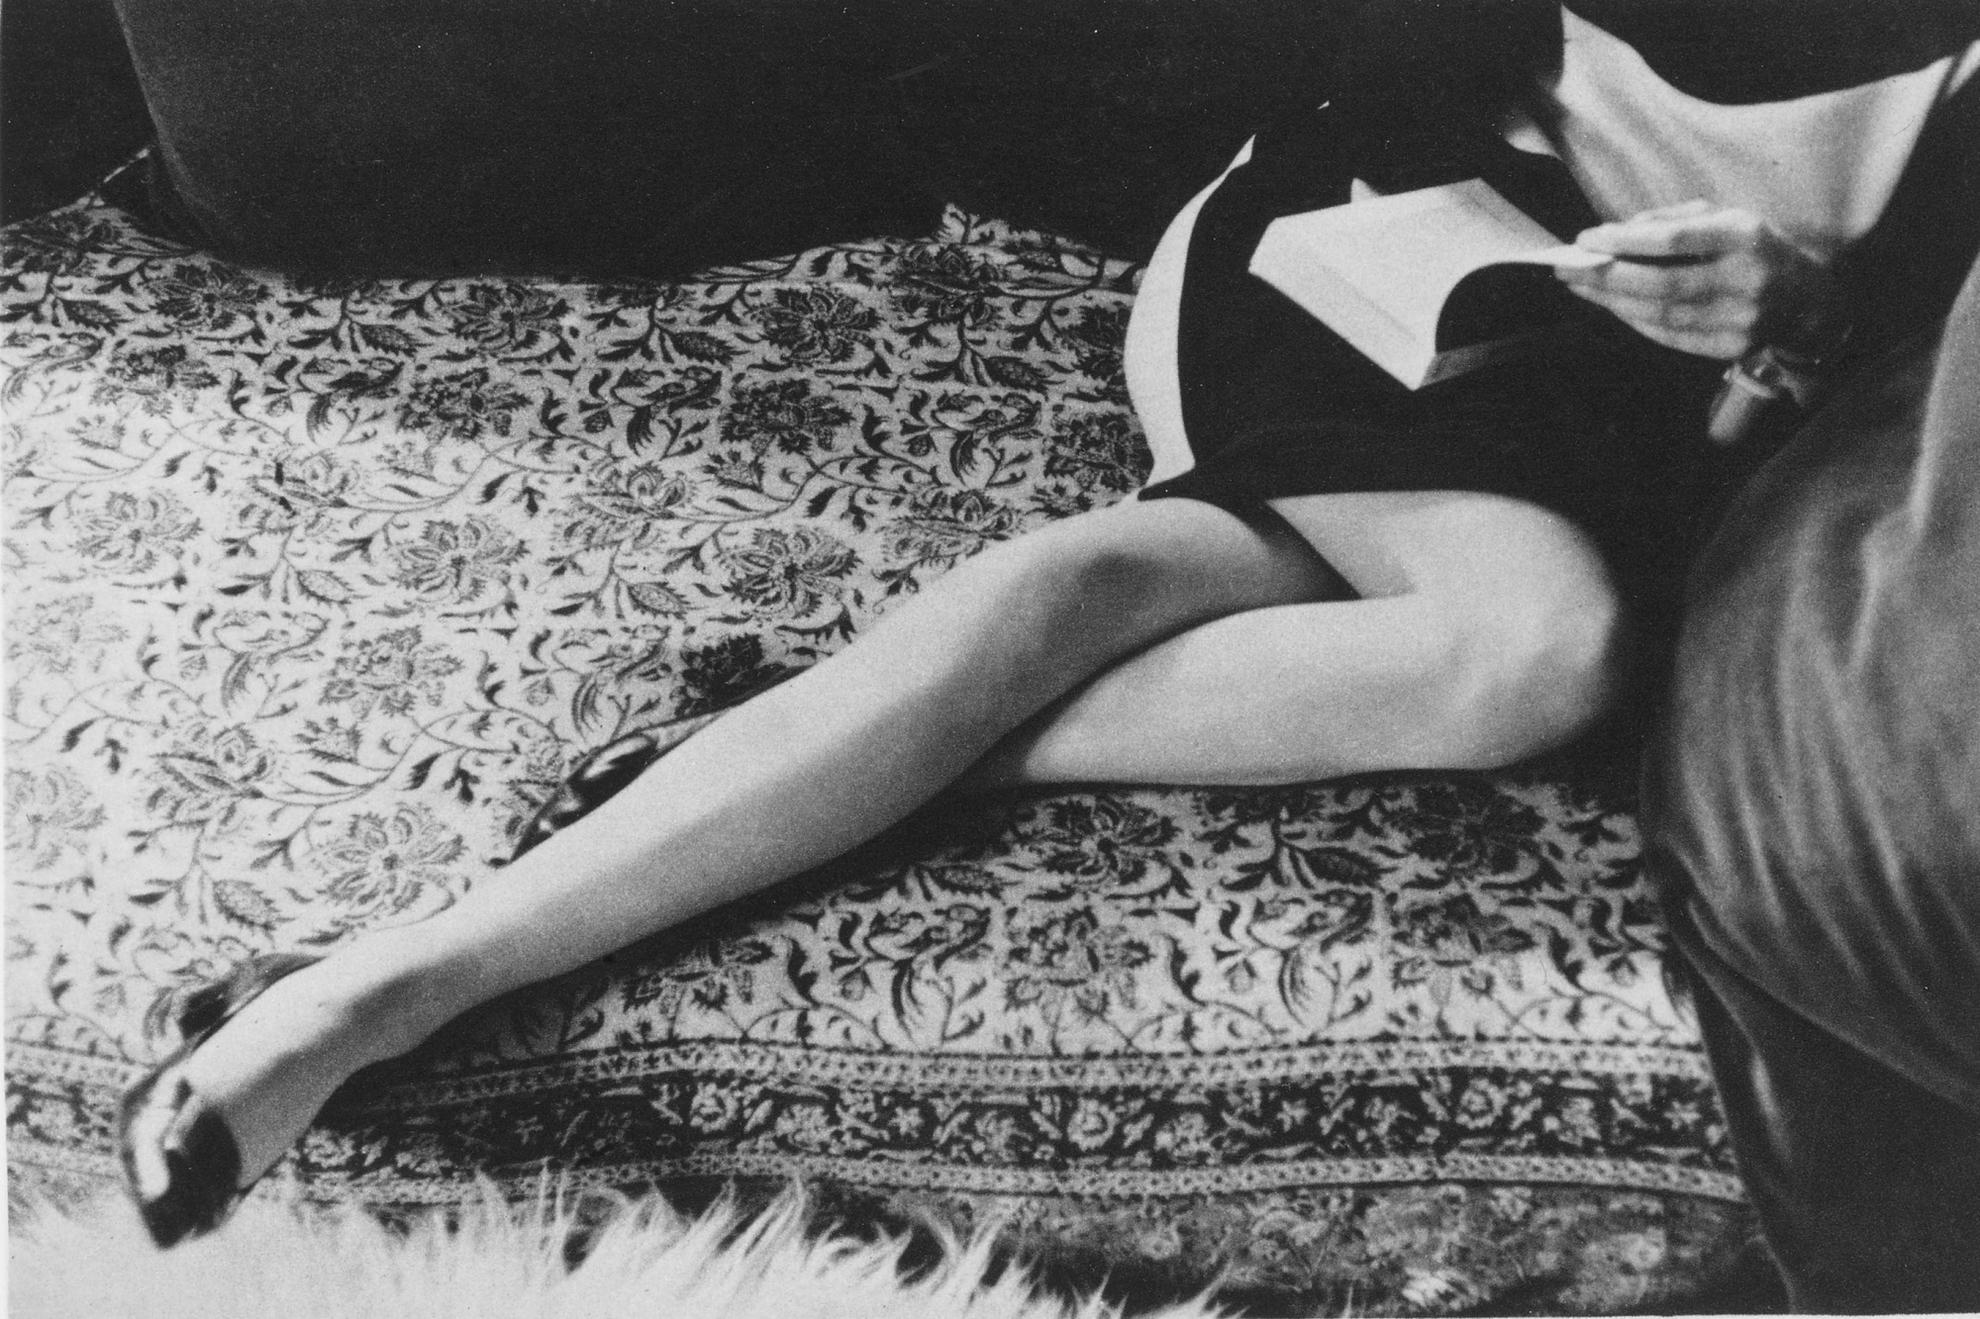 Henri Cartier-Bresson-Henri Cartier-Bresson-1989